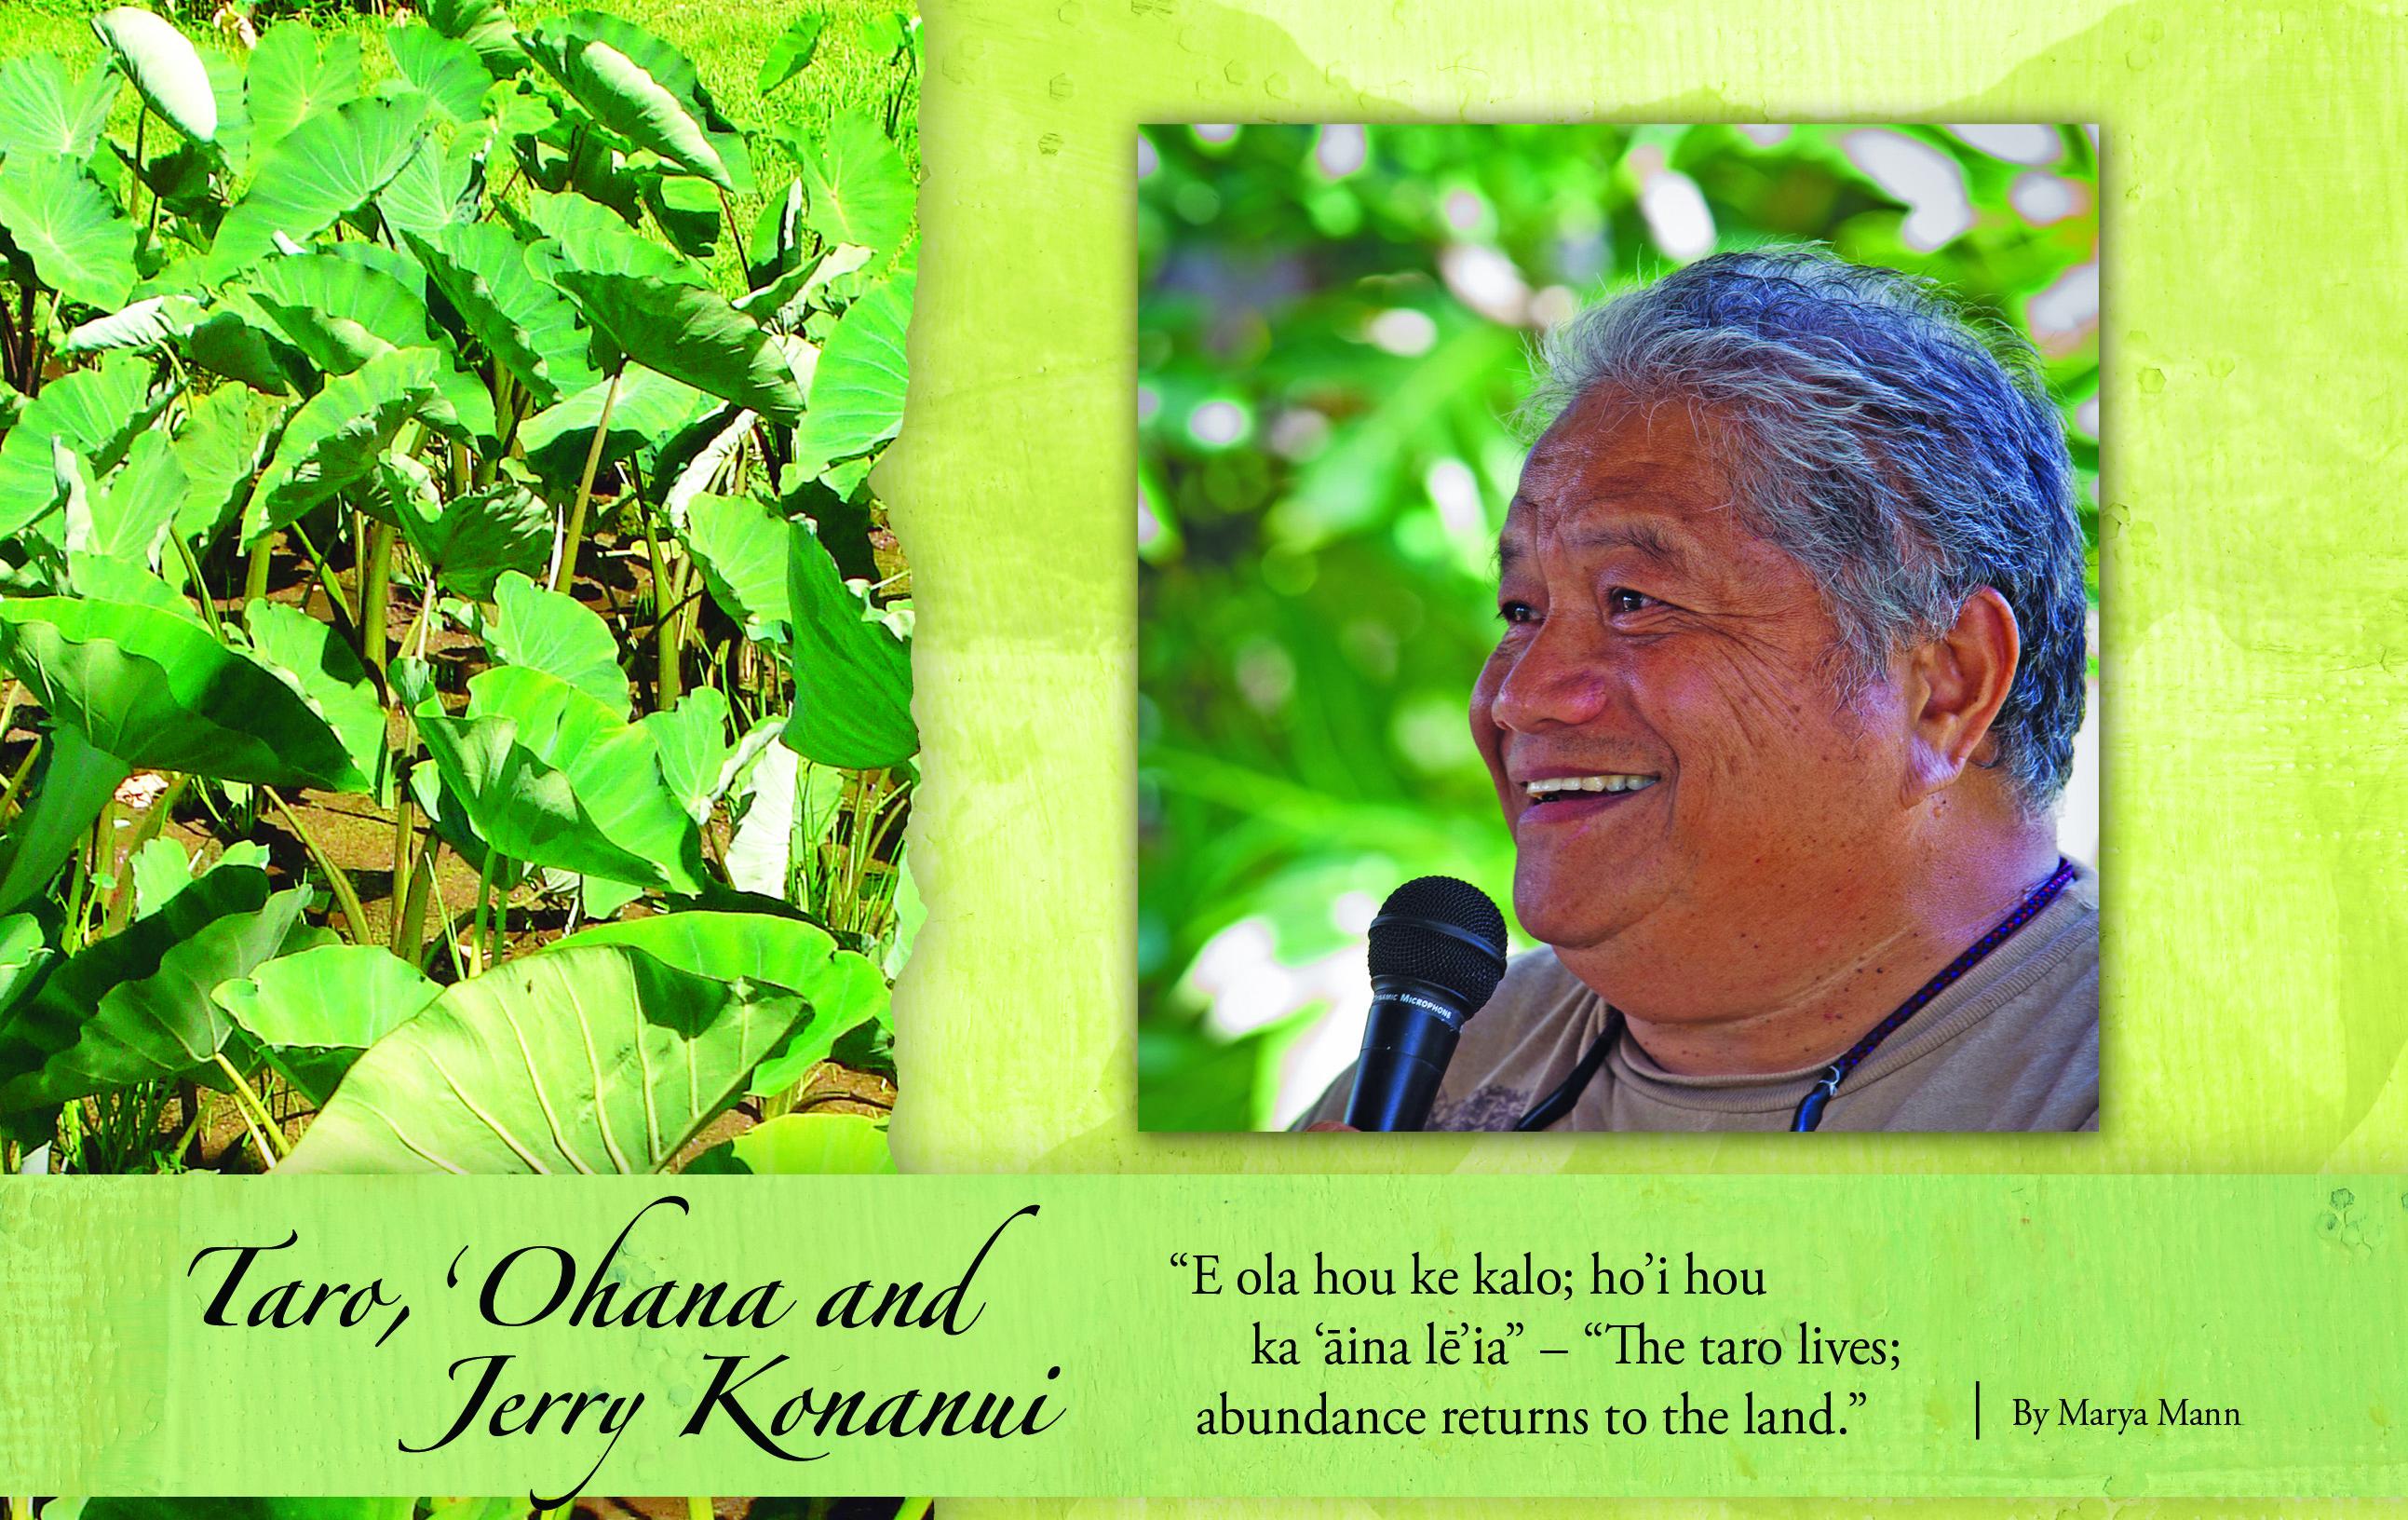 Taro and Jerry Konanui - image